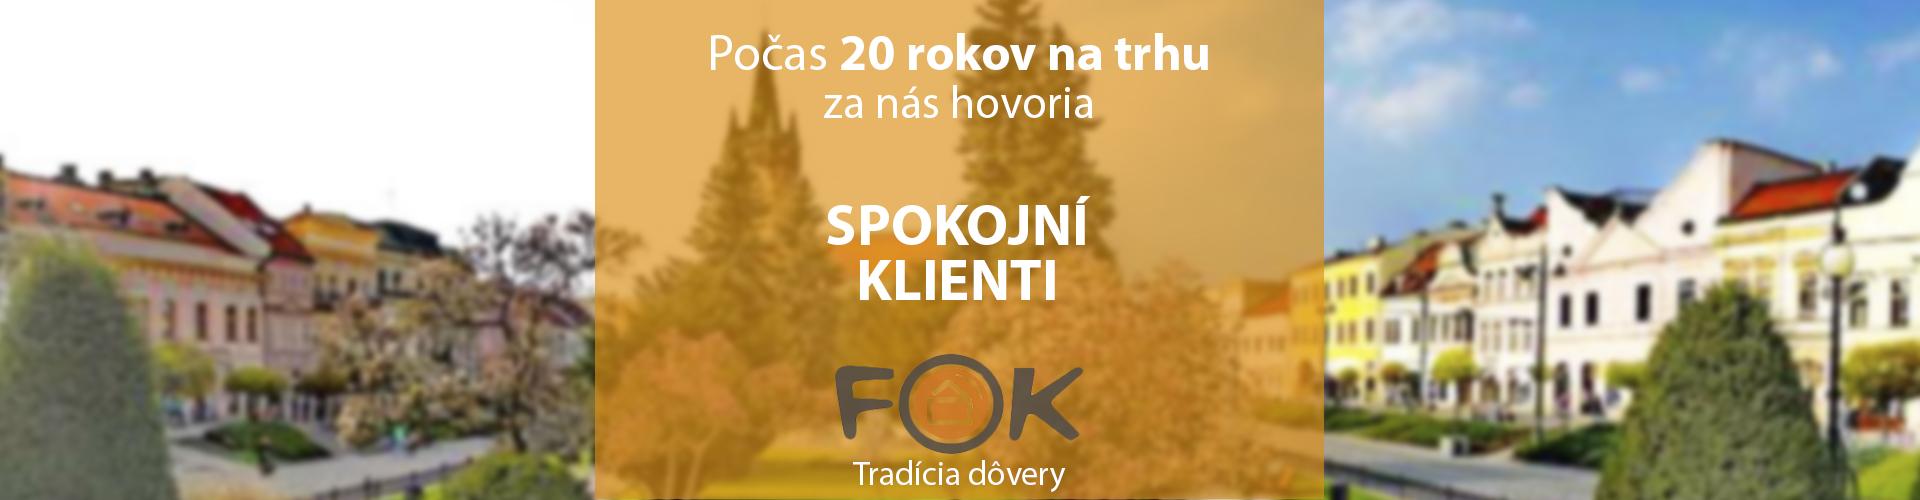 FOK_Reality2